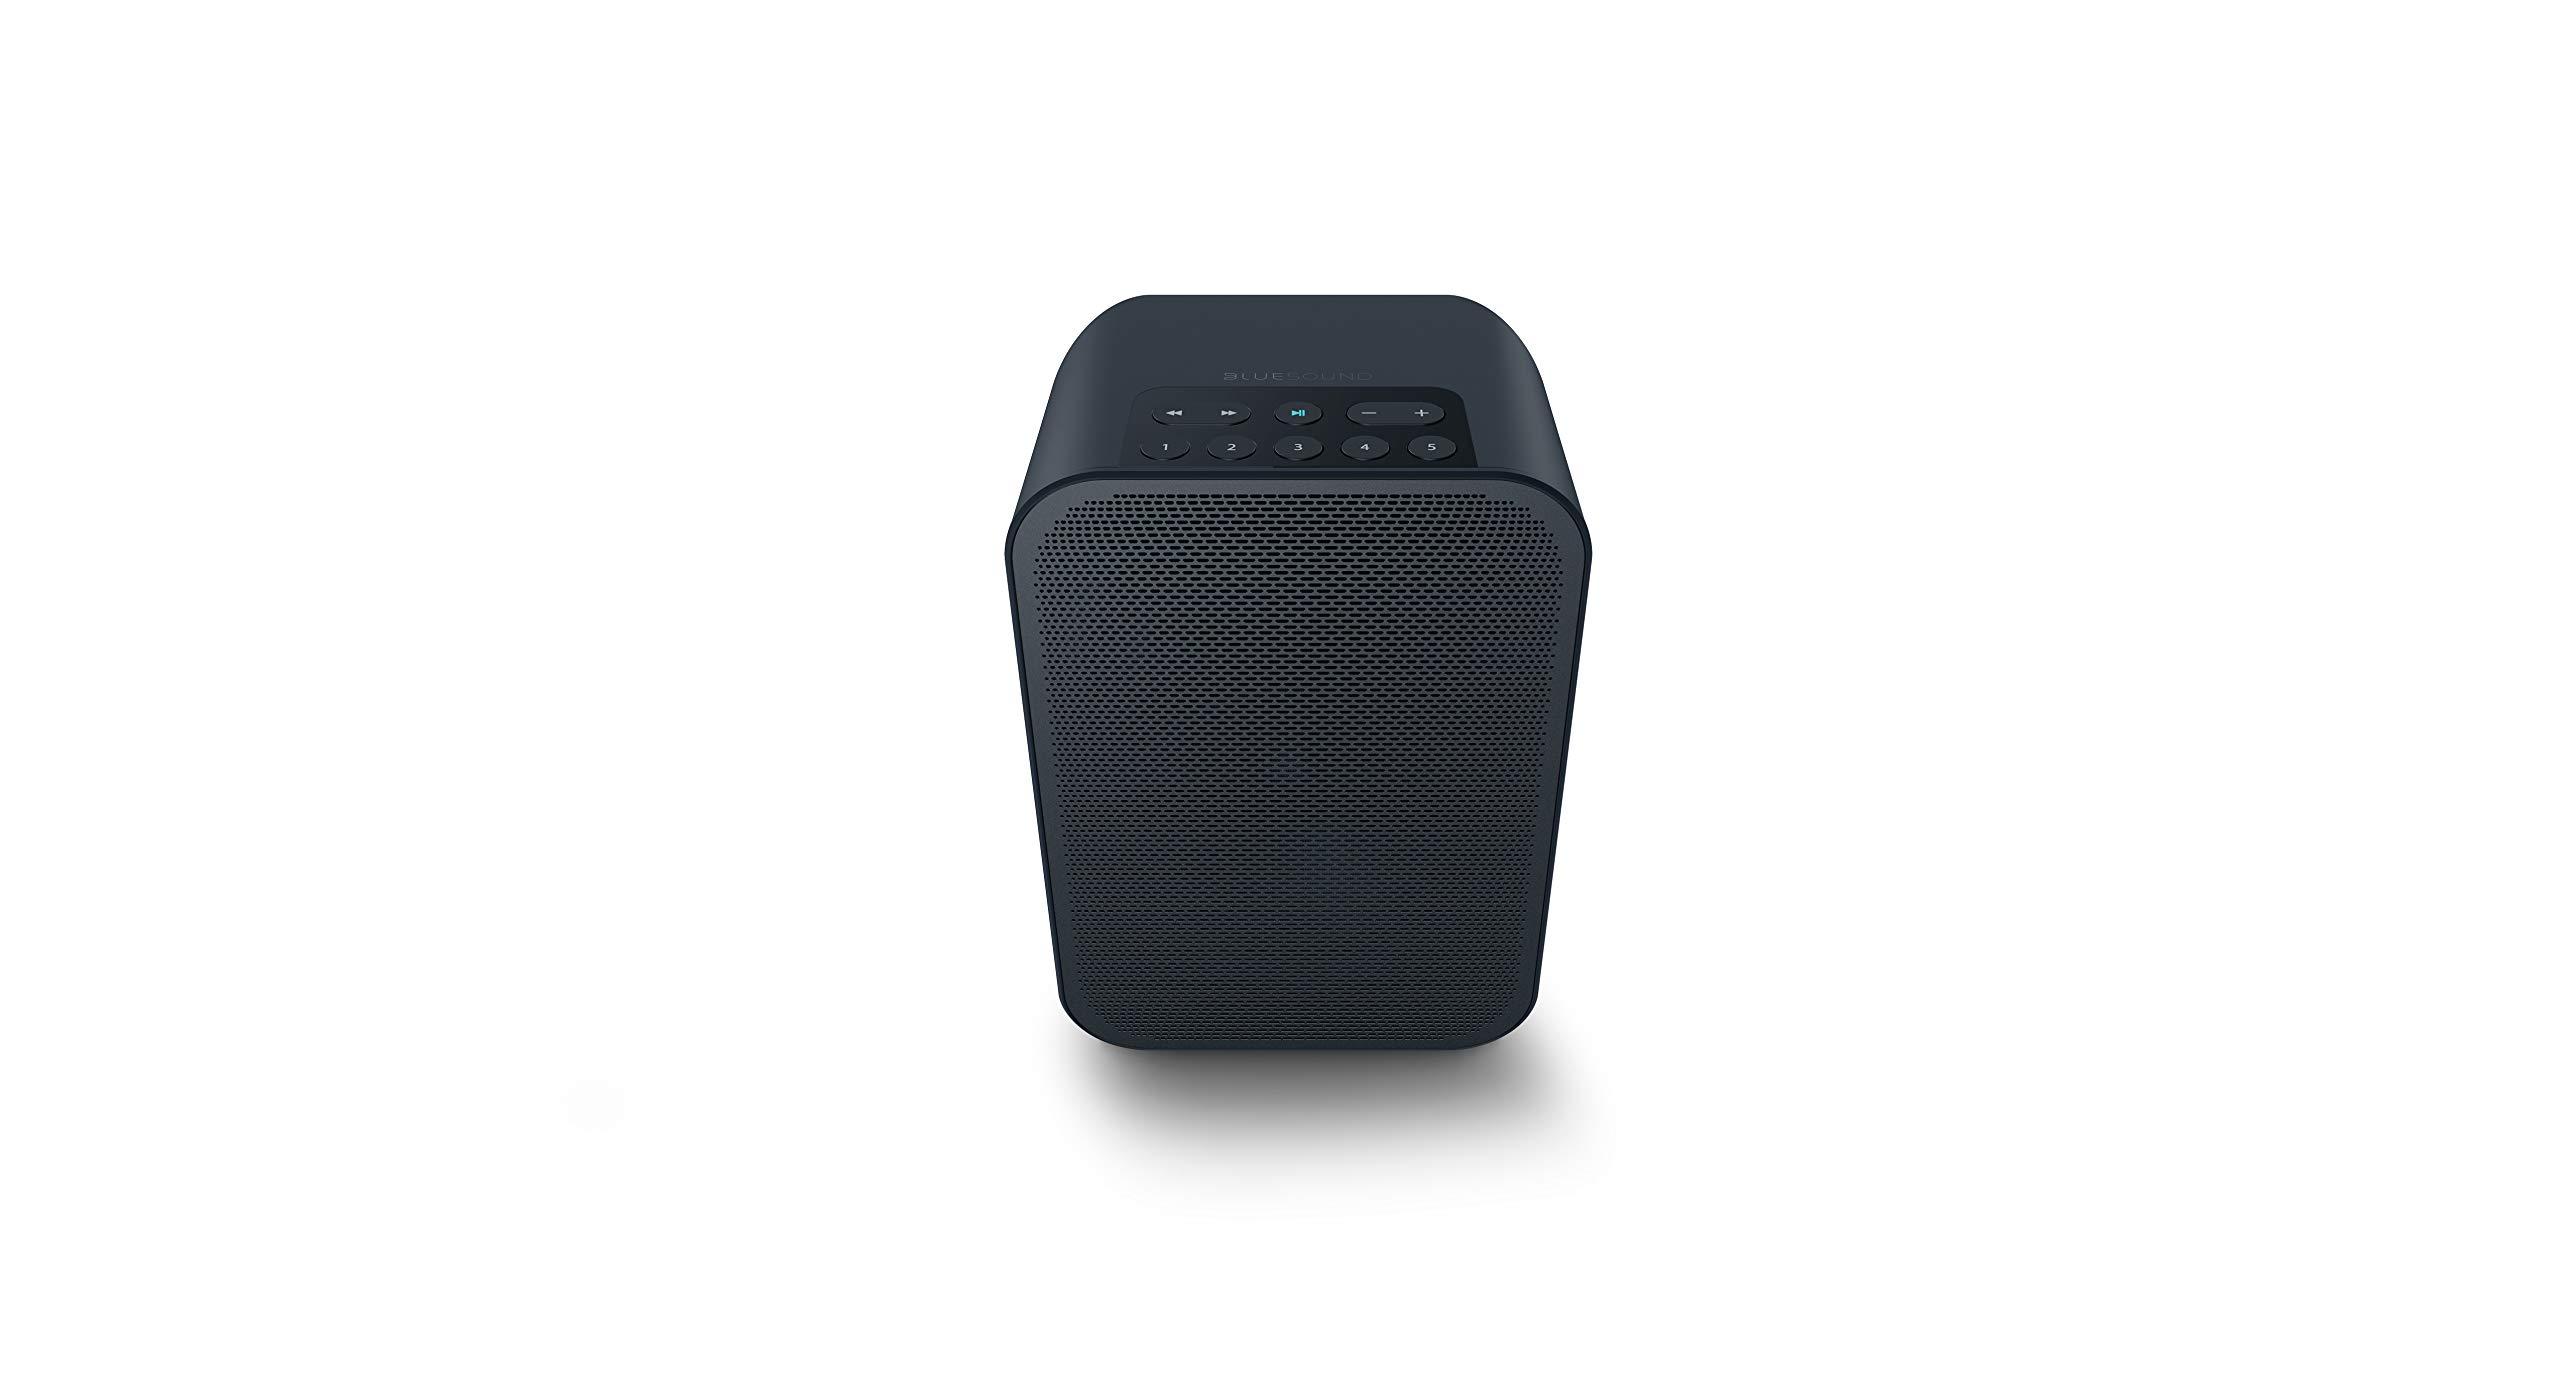 Bluesound Pulse Flex 2i Portable Wireless Multi-Room Smart Speaker with Bluetooth - Black - Works with Alexa and Siri